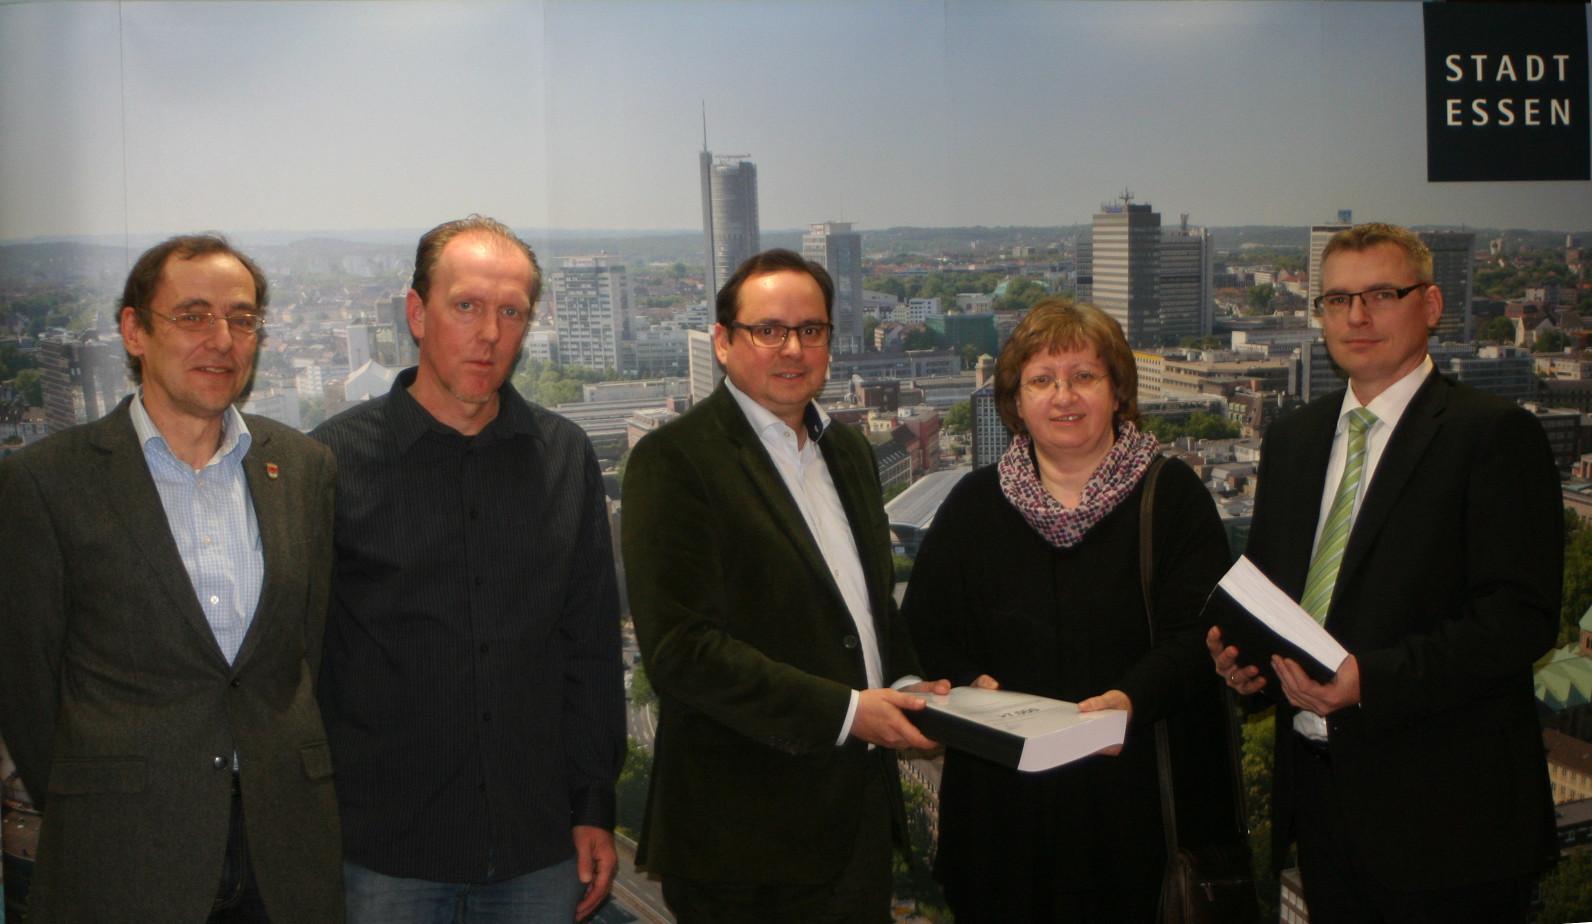 Foto: Thomas Pelka © Von links nach rechts: Thomas Pelka (Krayer Bürgerschaft); Andreas Kirchmann(BI); Thomas Kufen(OB); Karin Pfeffer(BI); Christian Kallweit(BI)